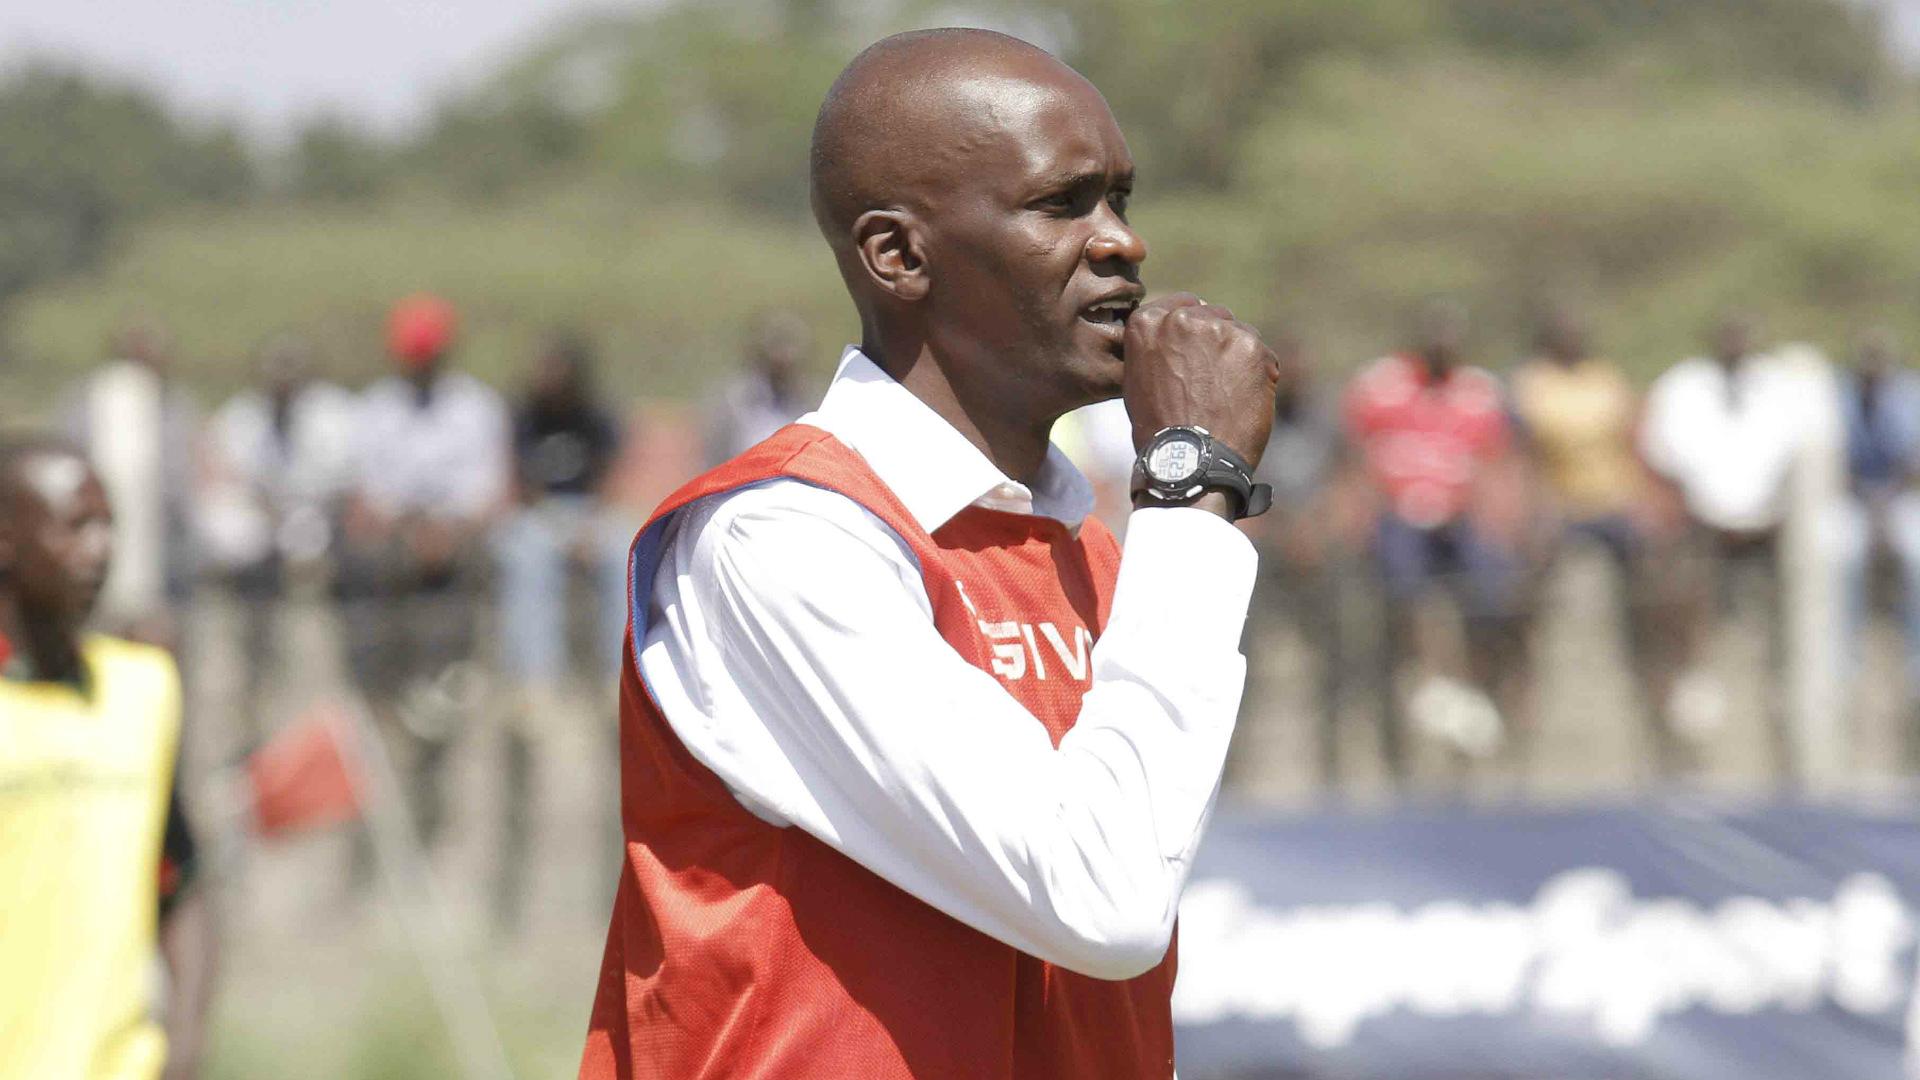 Kariakoo Derby: Simba SC will come into match under pressure' – Ambani | Goal.com